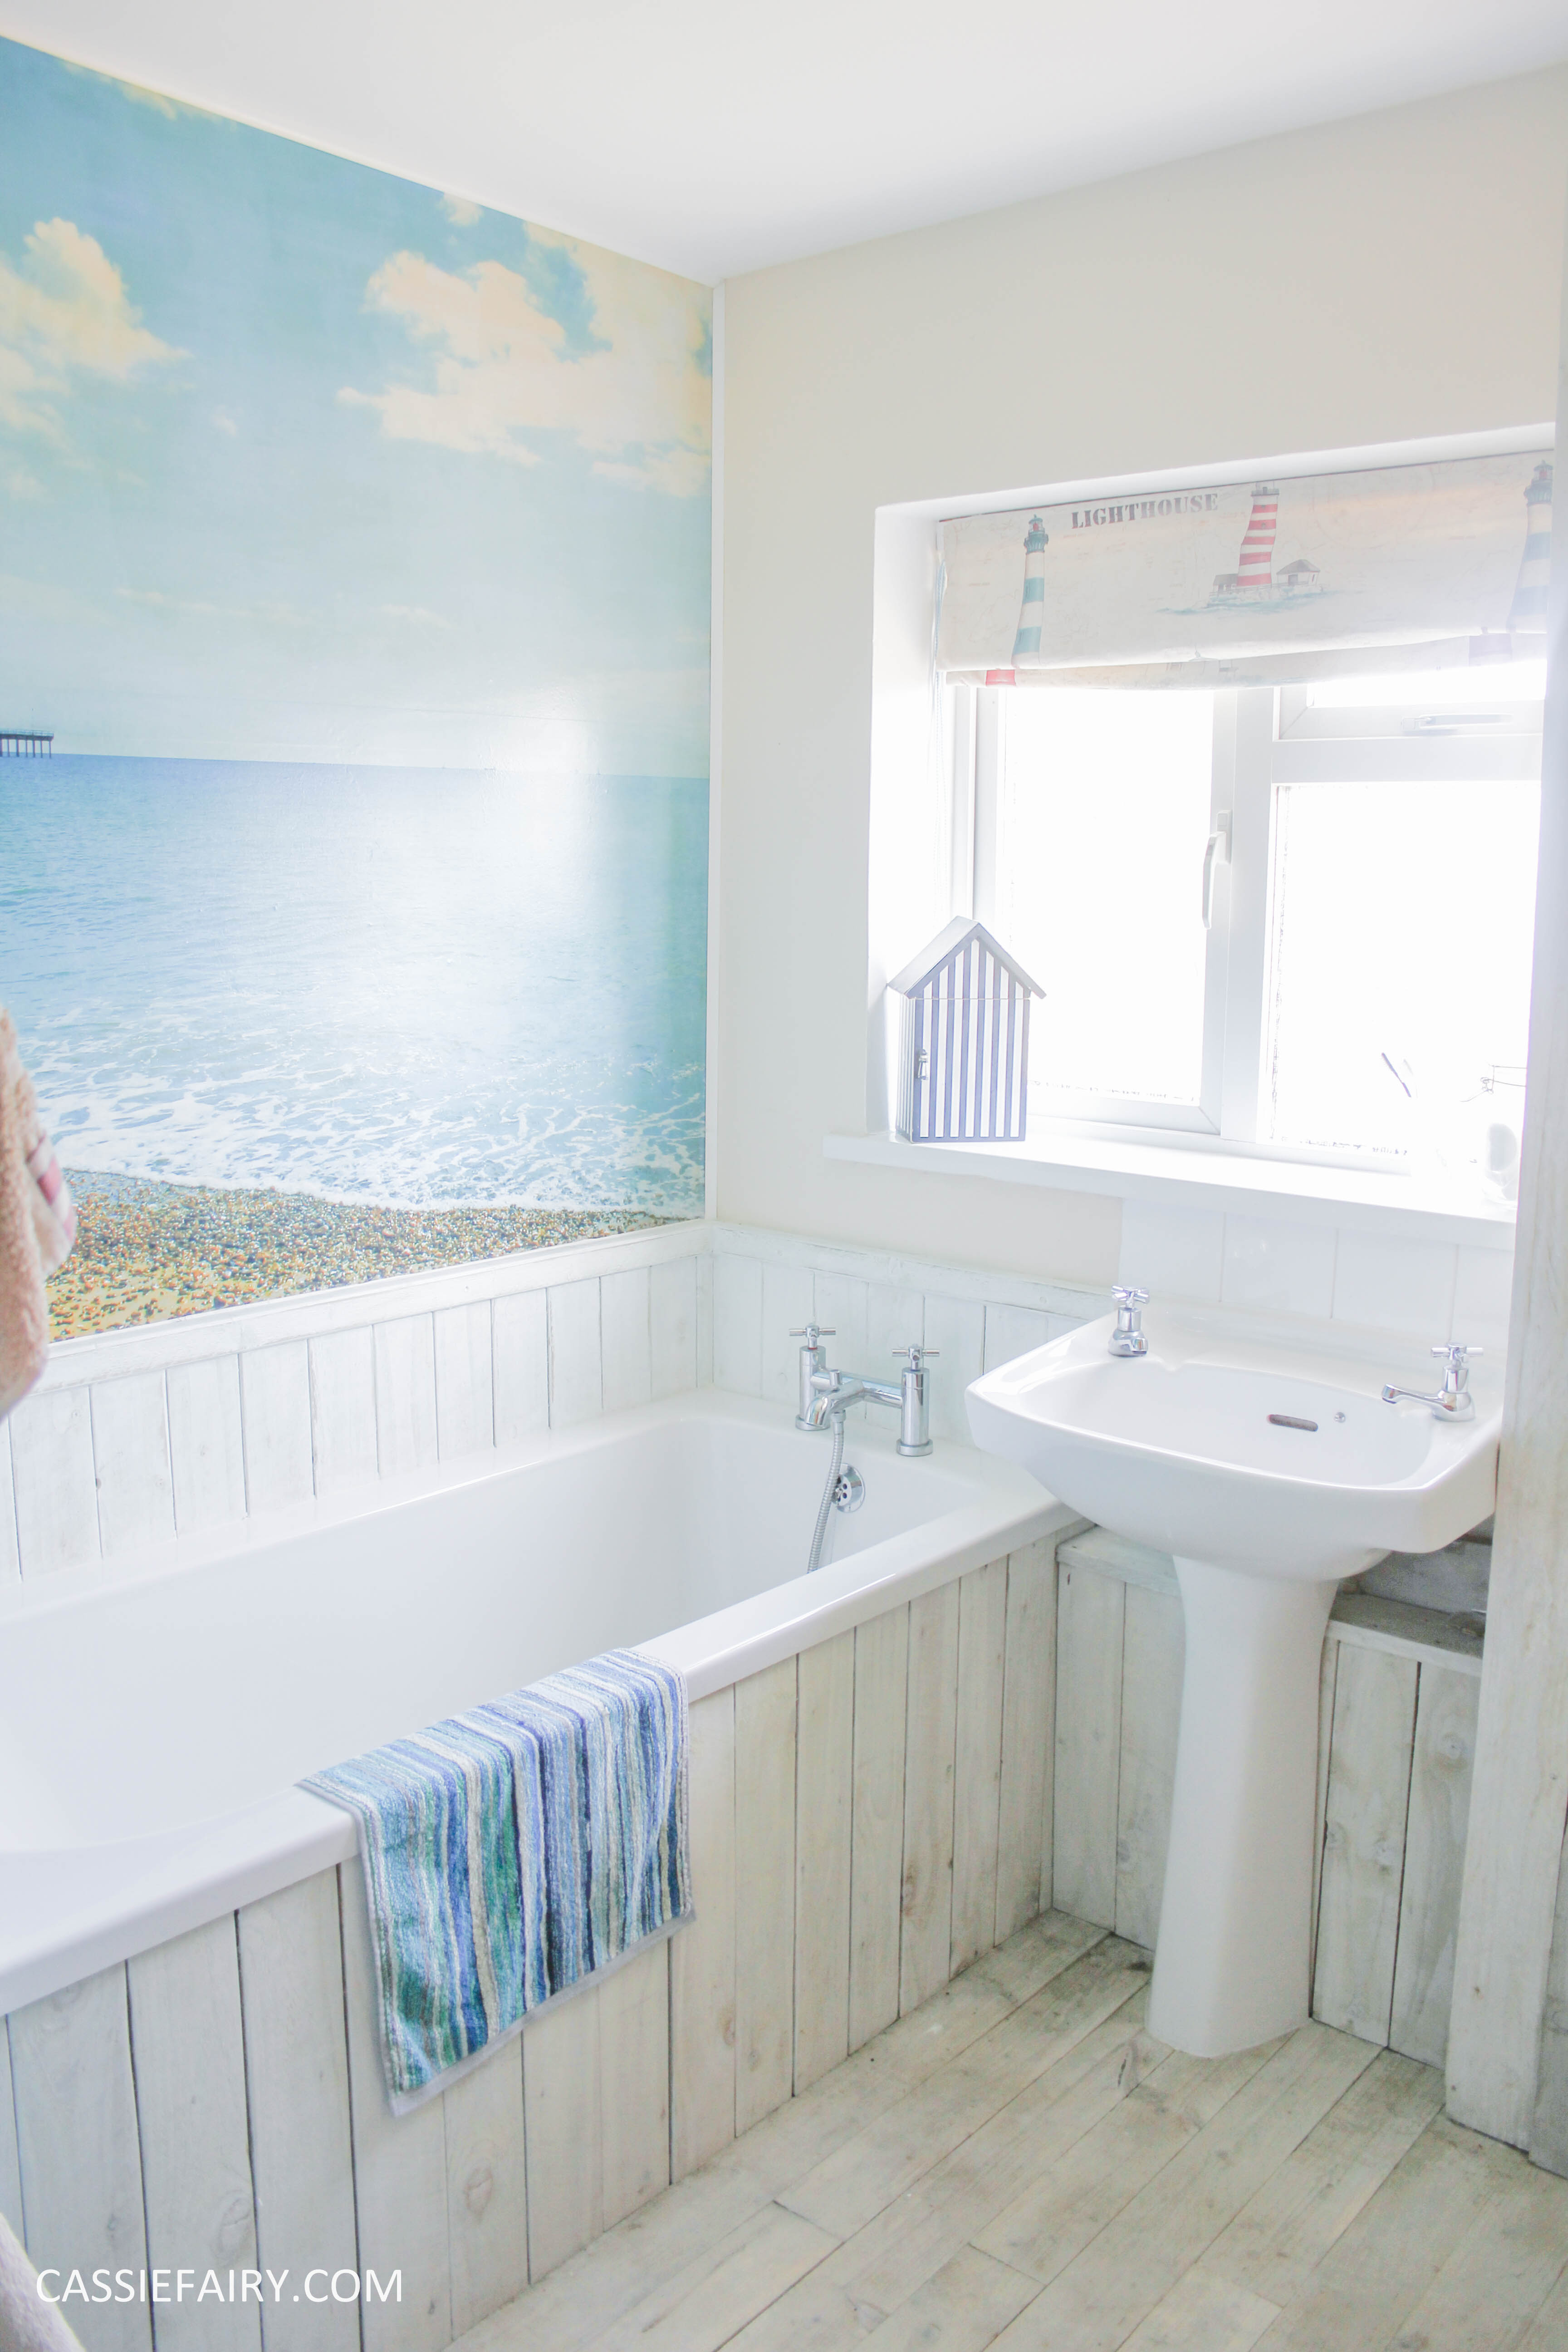 Diy Beach Hut Bathroom Makeover Project Low Budget Renovation 15